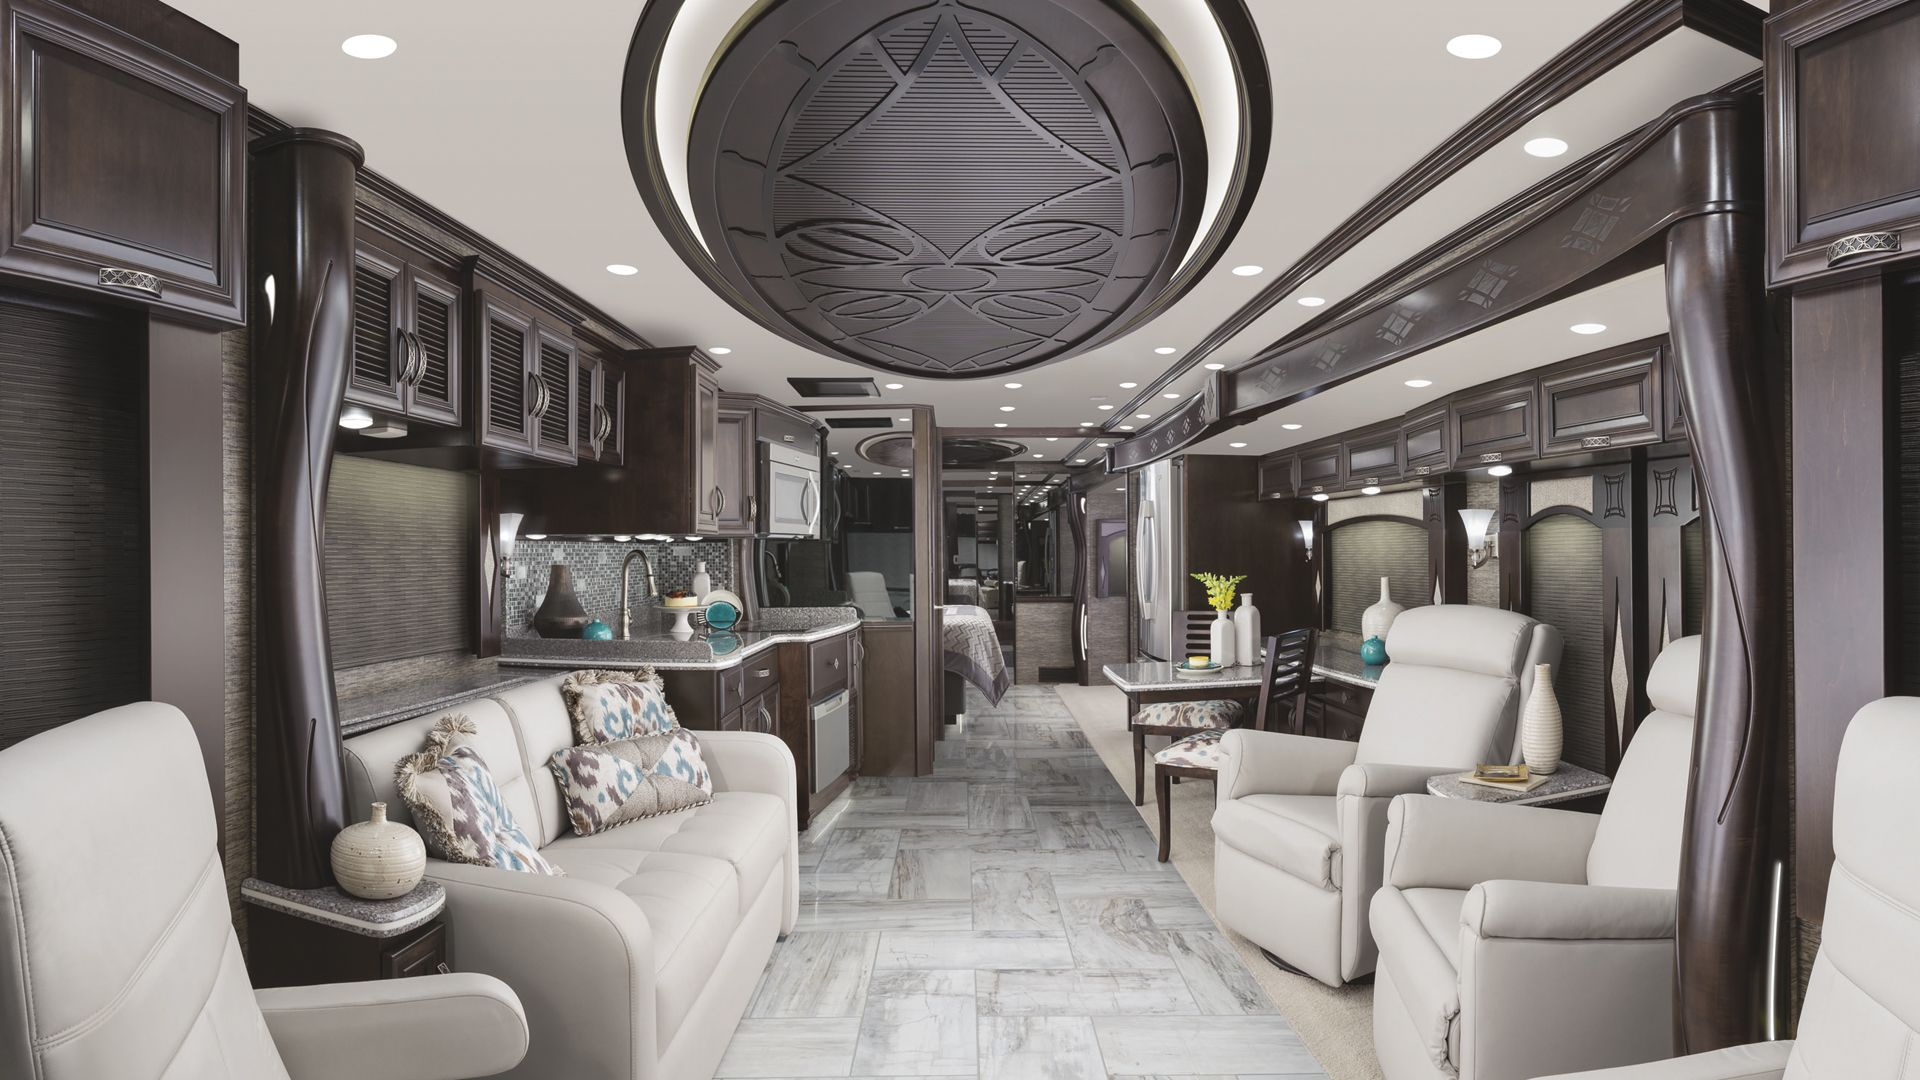 2015 newmar london aire luxury interior motorhome